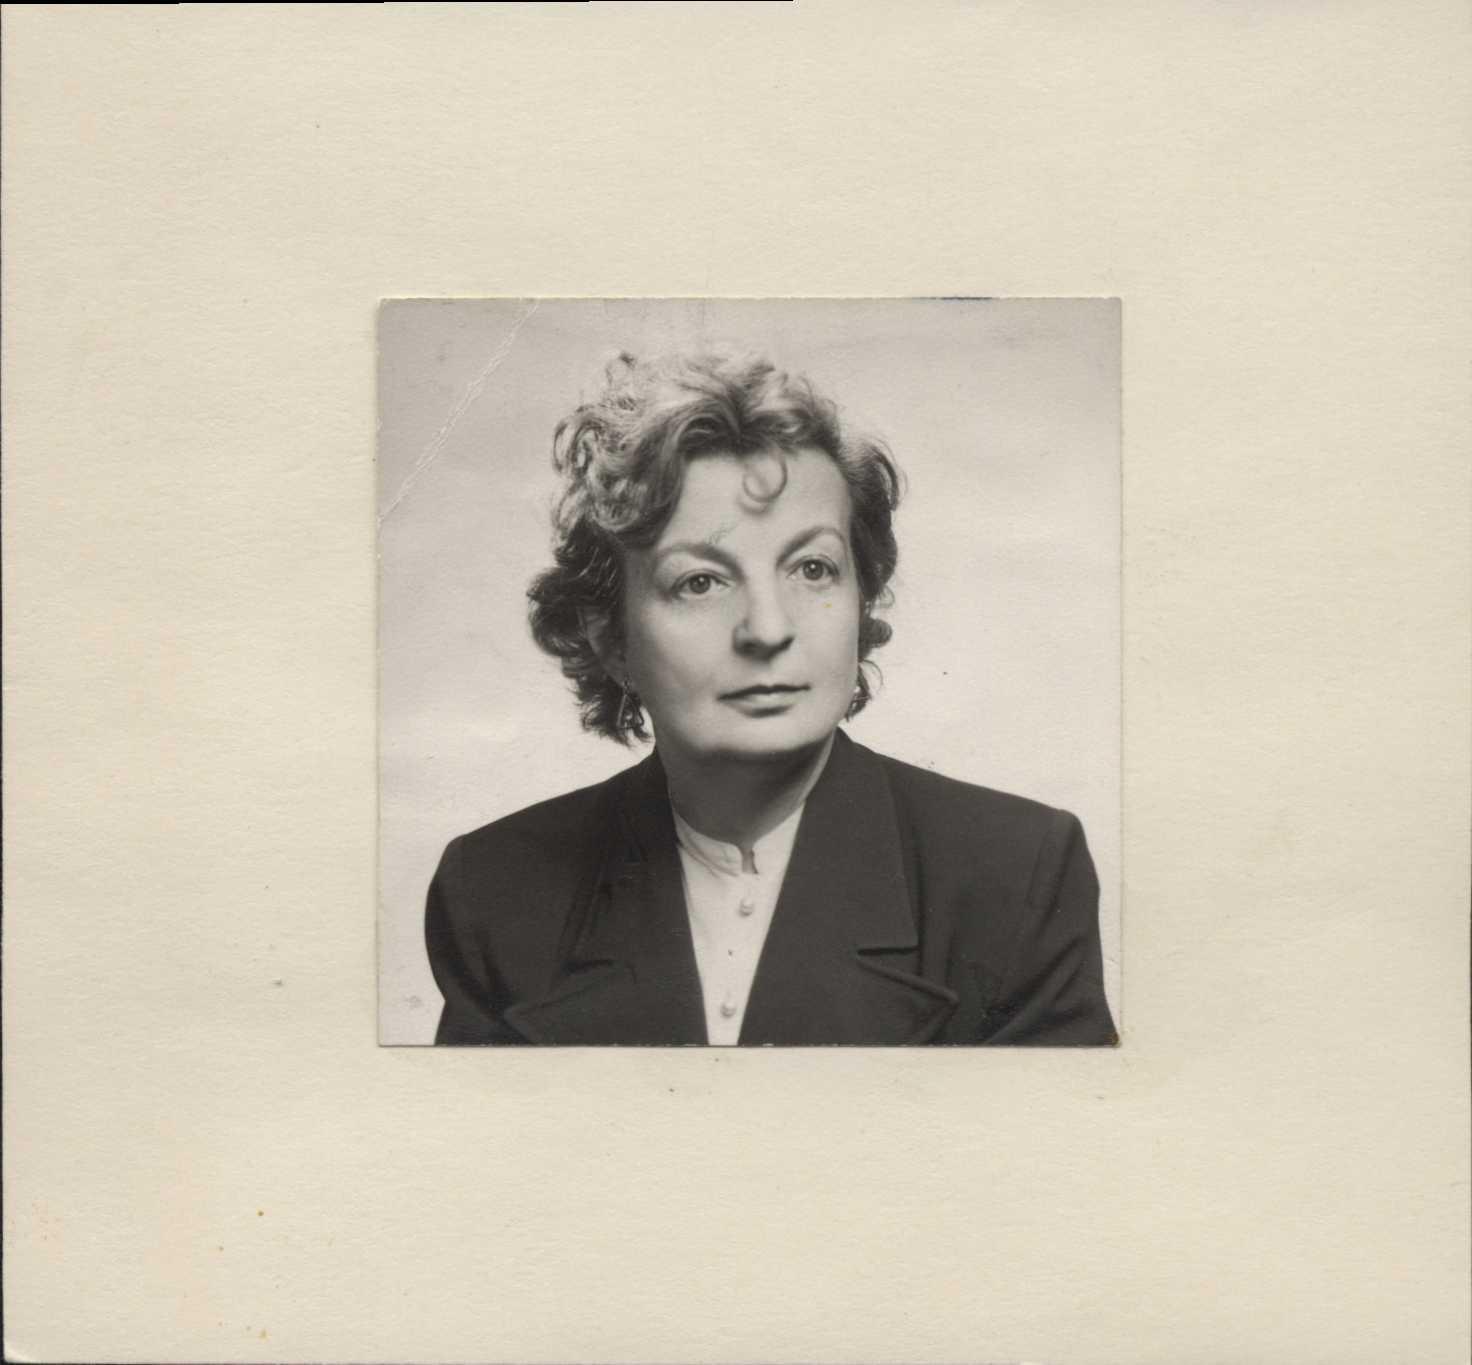 Hilda Geiringer Portrait Photo